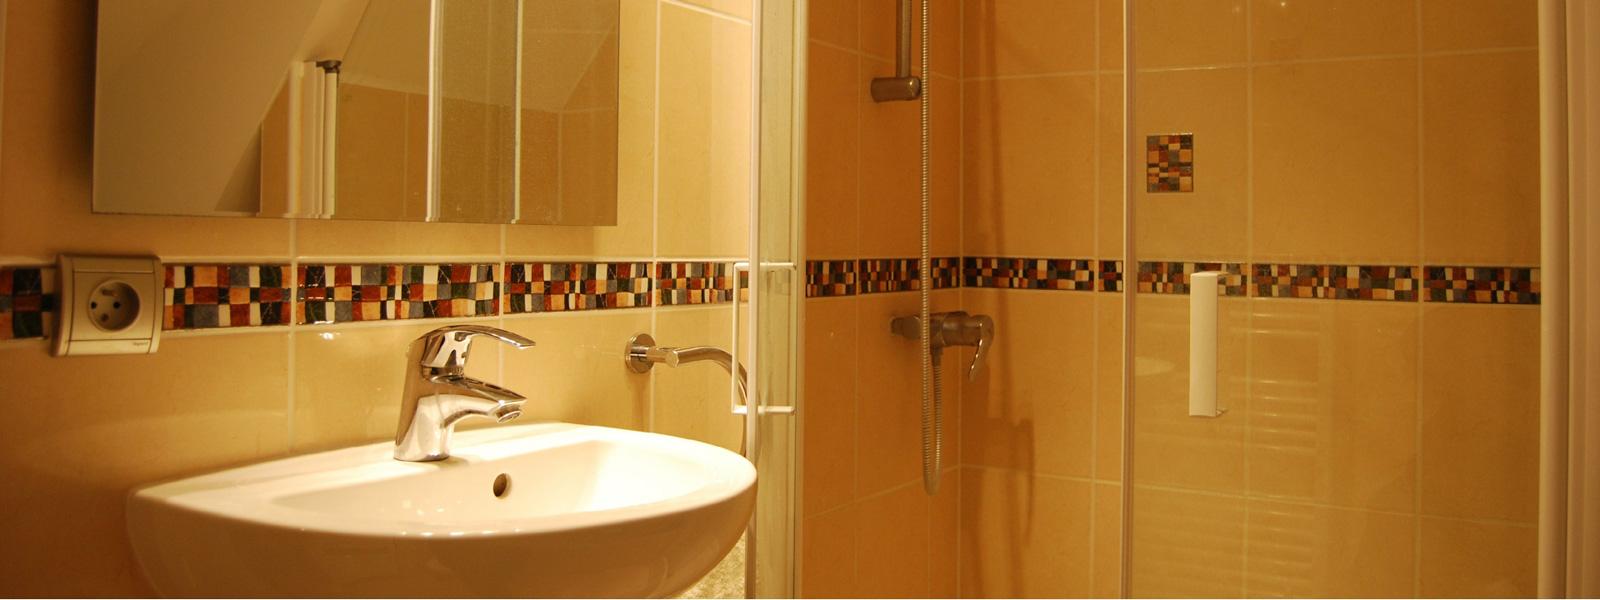 https://selectcottages.com/sites/default/files/revslider/image/chaumiere-bathroom-sepia.jpg